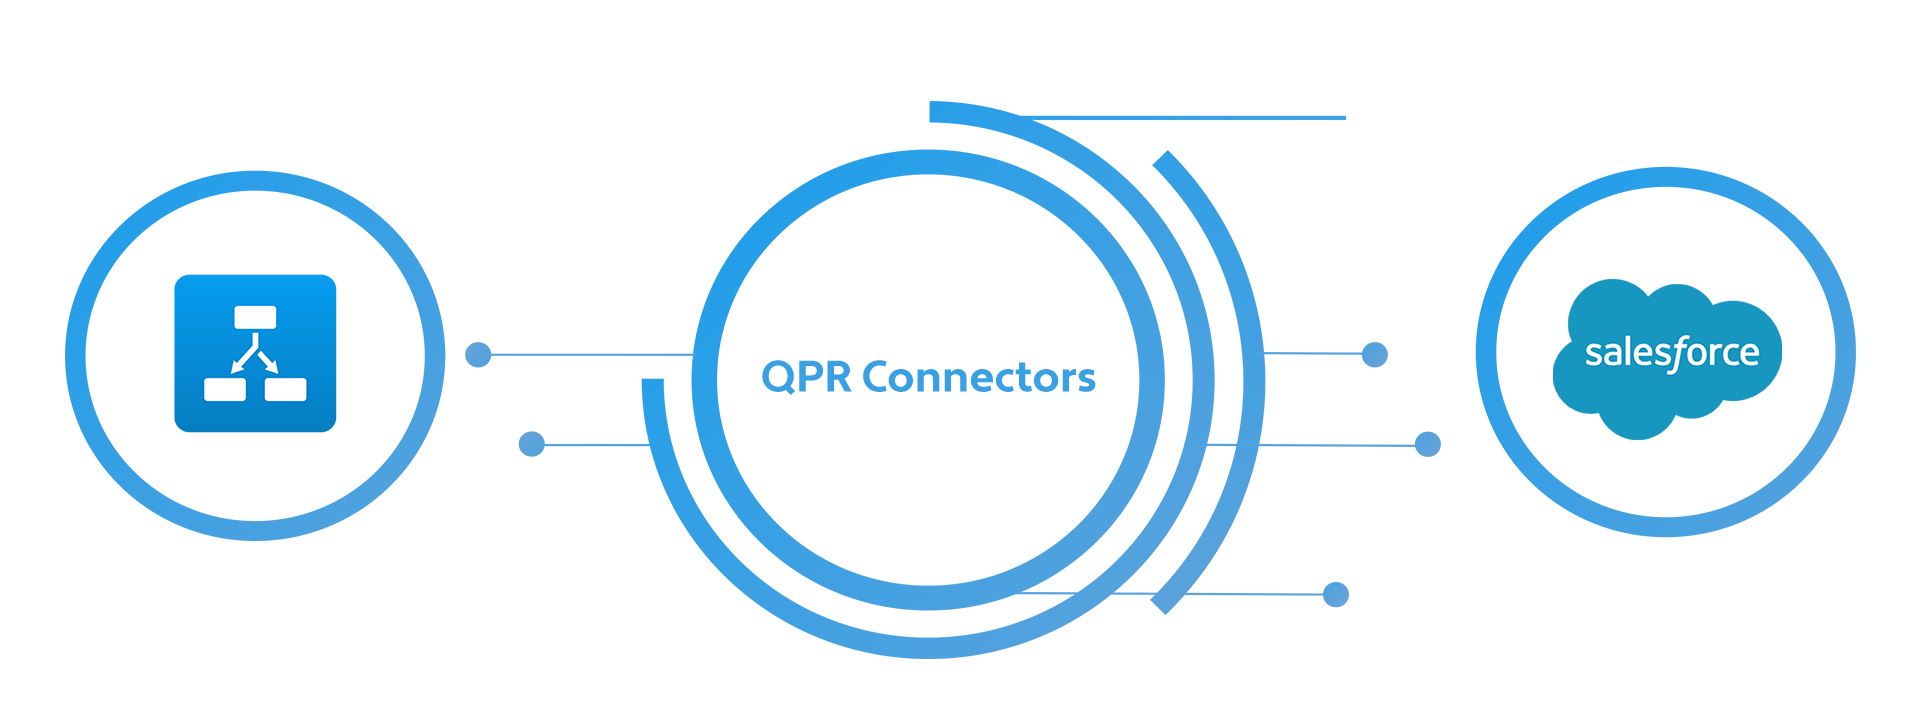 QPR-Connector-Salesforce+Process-Mining